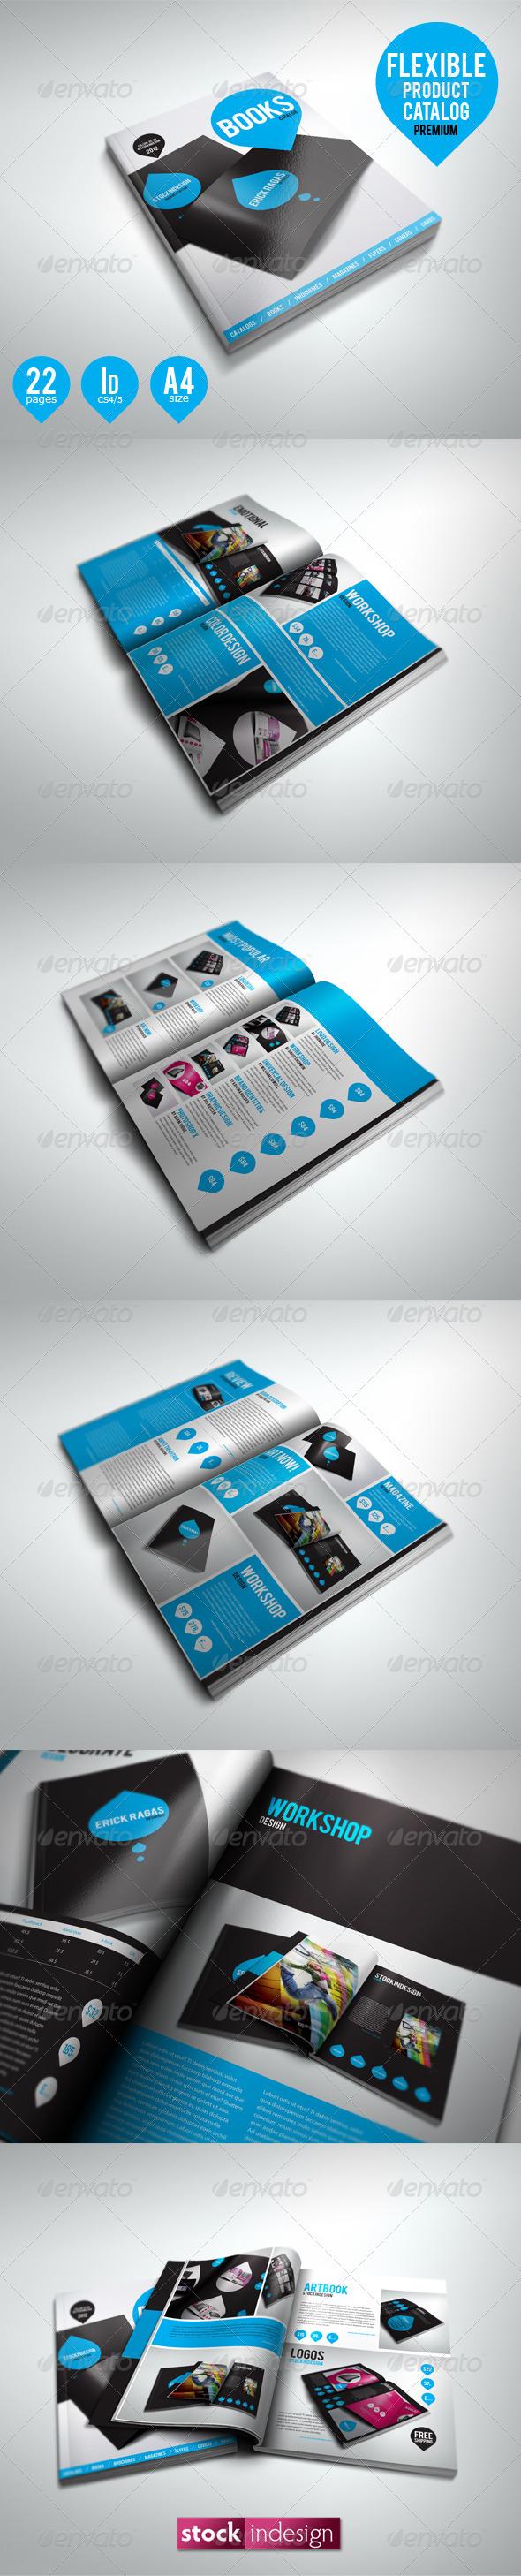 GraphicRiver Flexible Product Catalog Premium 1596175